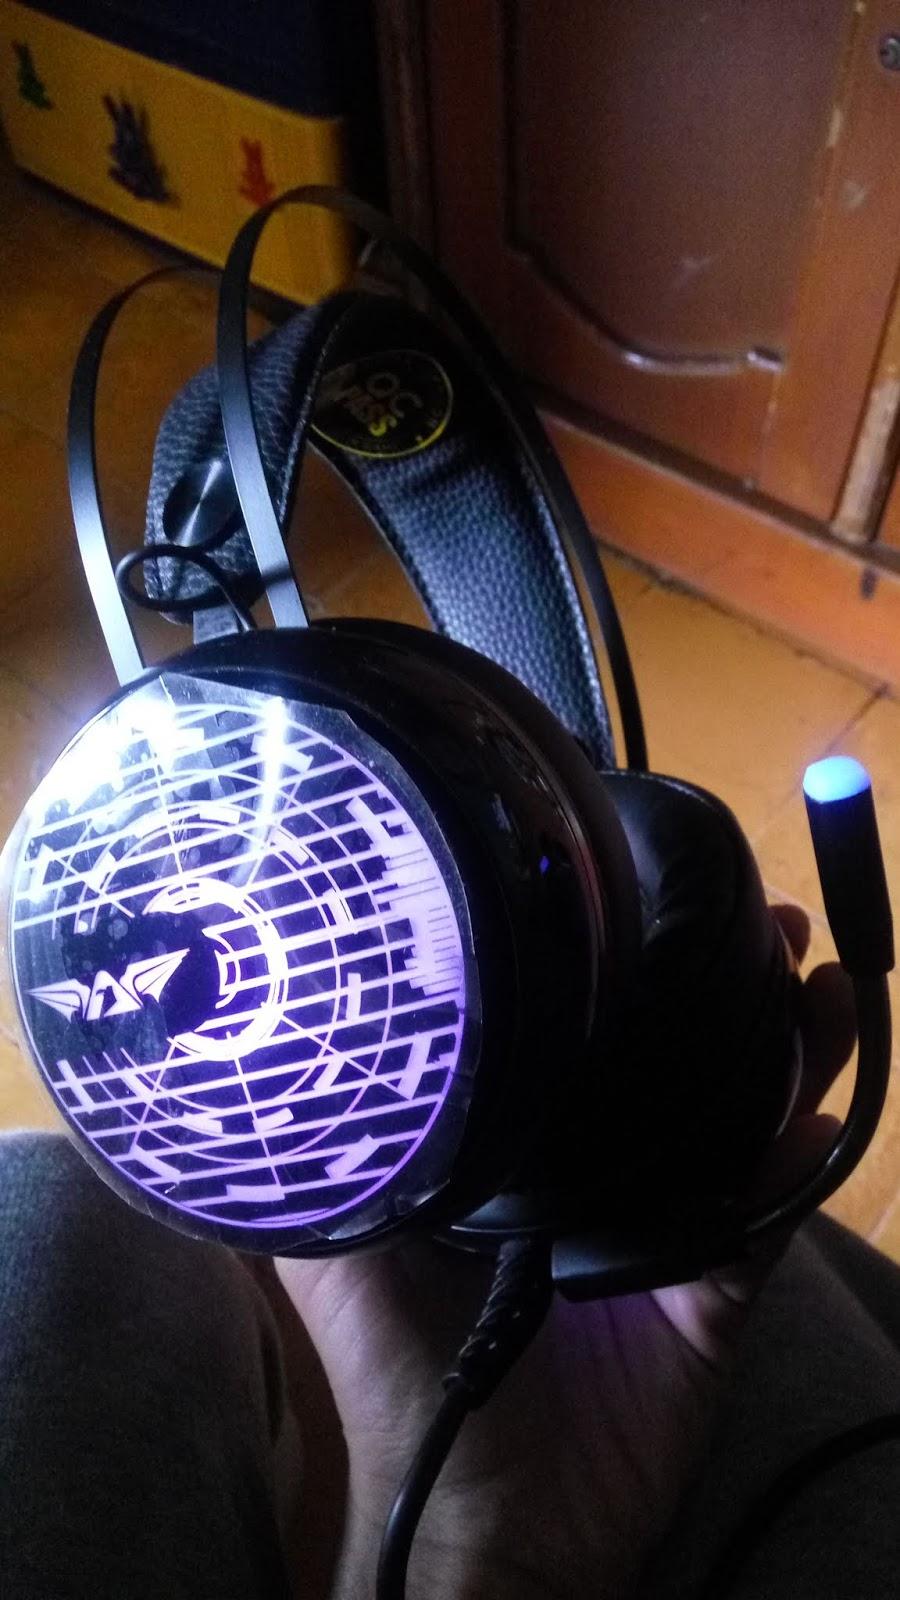 ✓ Headset Nuke 7 Jadikan Gaming Lebih Seru - 6 kumpulan